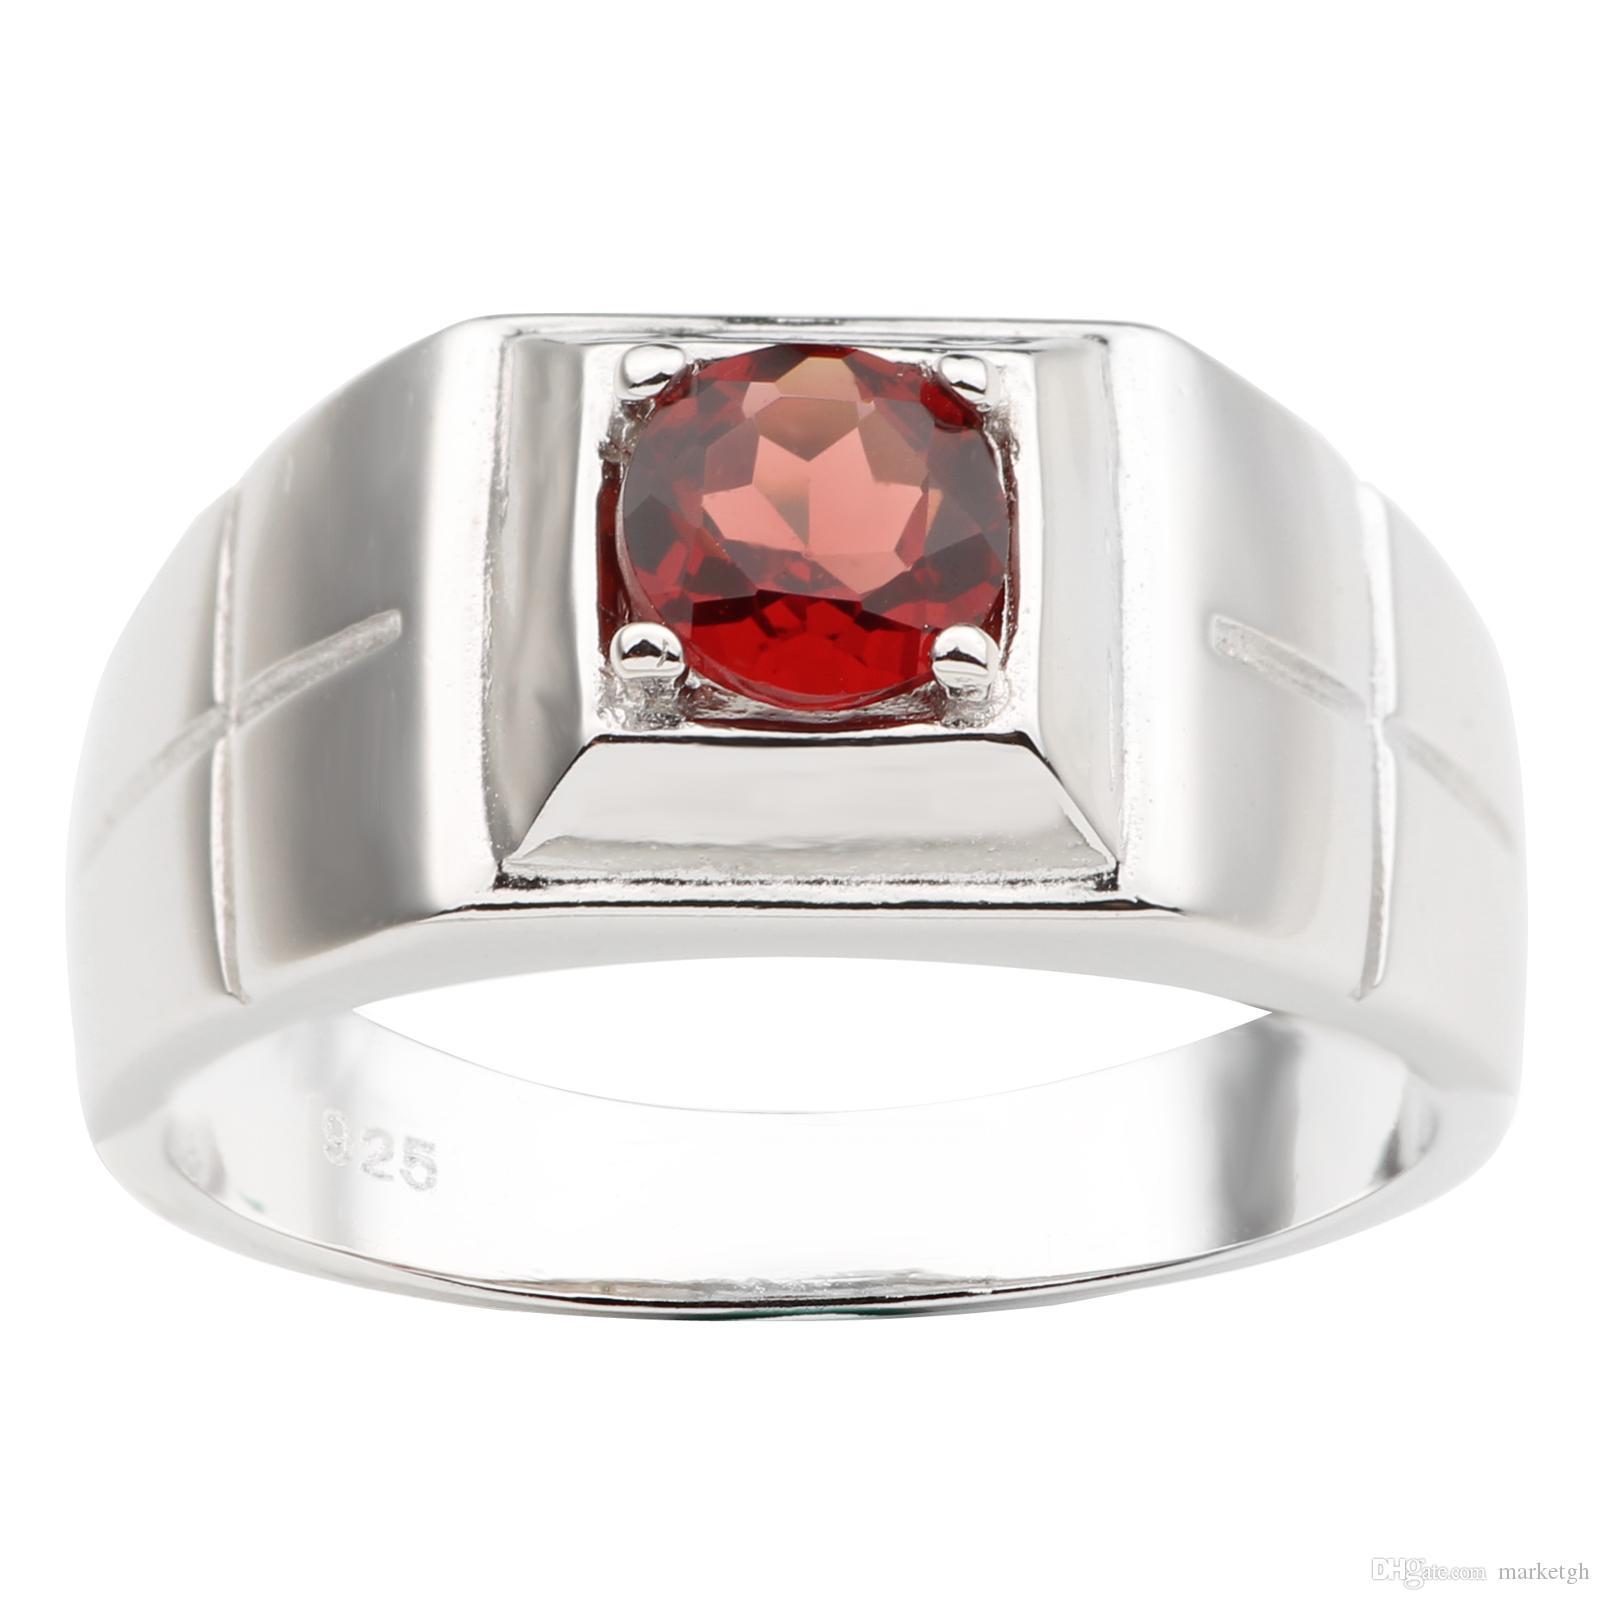 Natural Gemstone Silver Ring 925 Jewelry Men Women Size 5,6,7,8,9,10,11,12,13